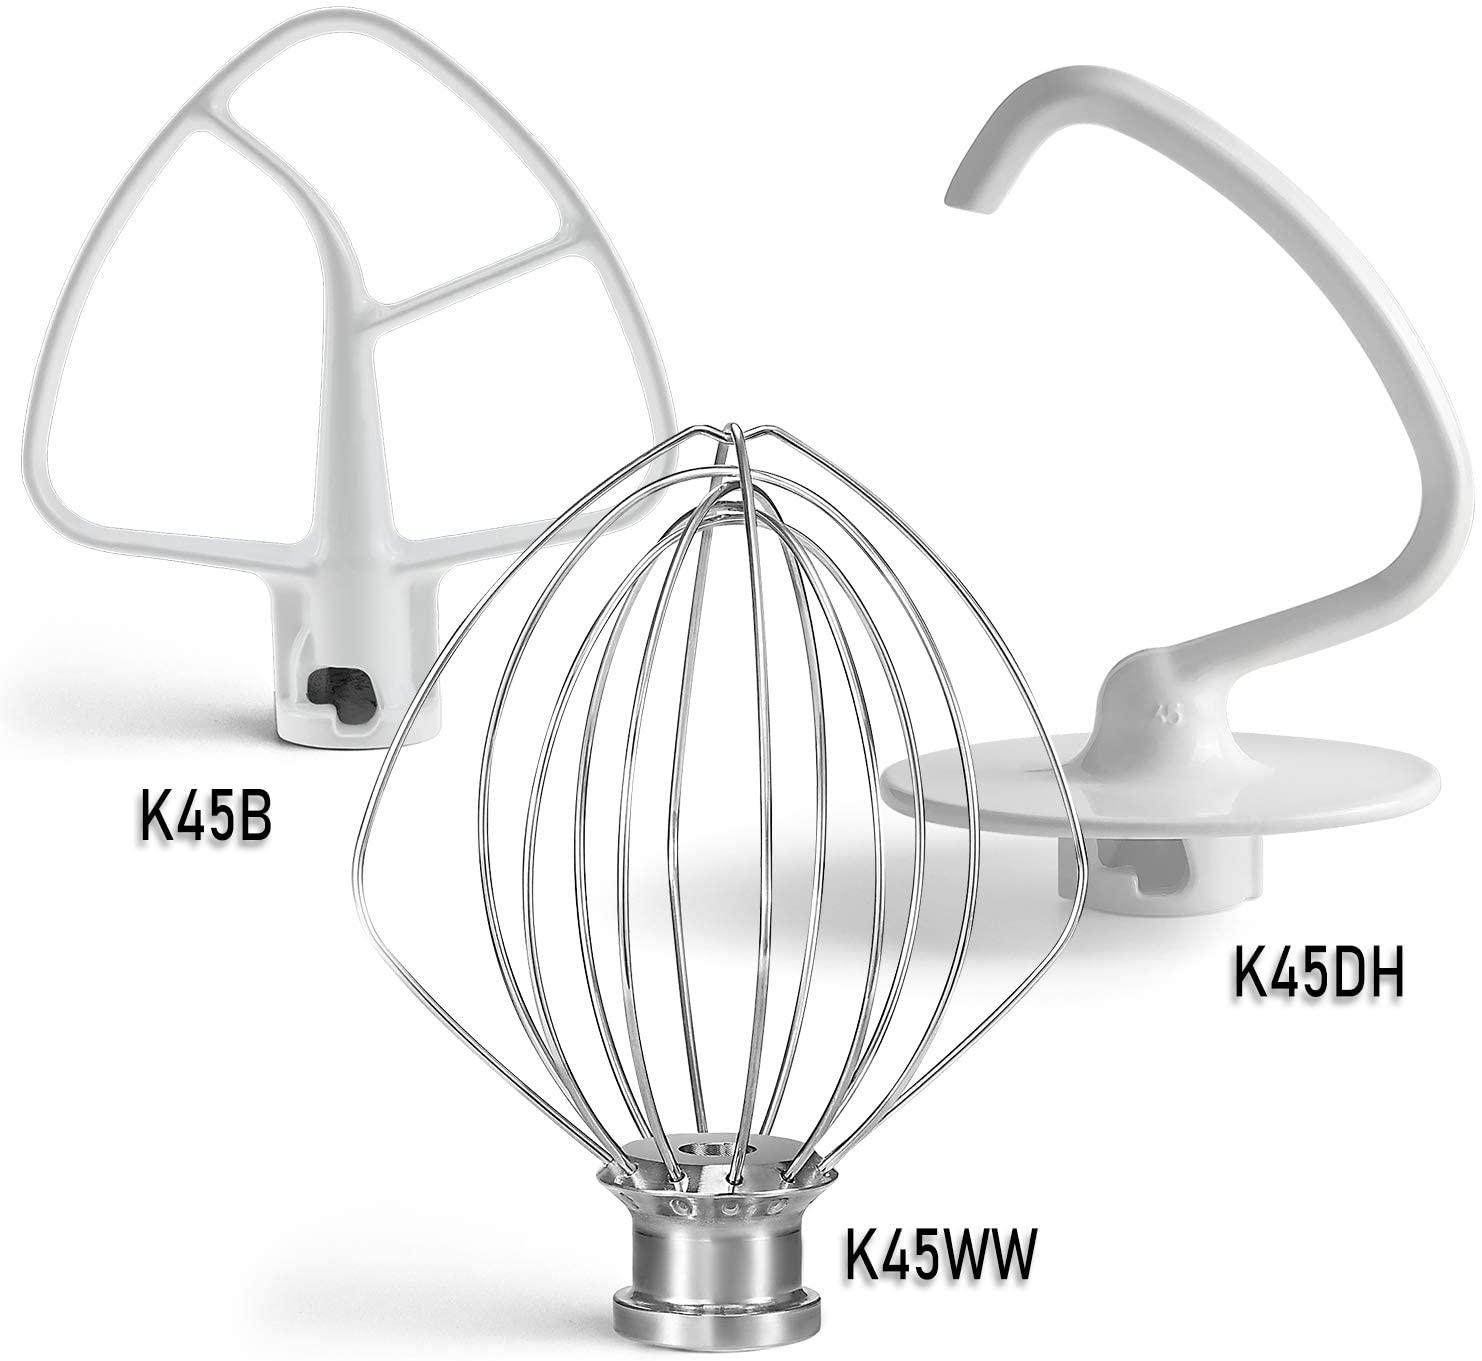 Primeswift K45DH dough hook,K45B flex edge beater and K45WW wire whip 3 Pieces 5 Quart Mixer Replacement